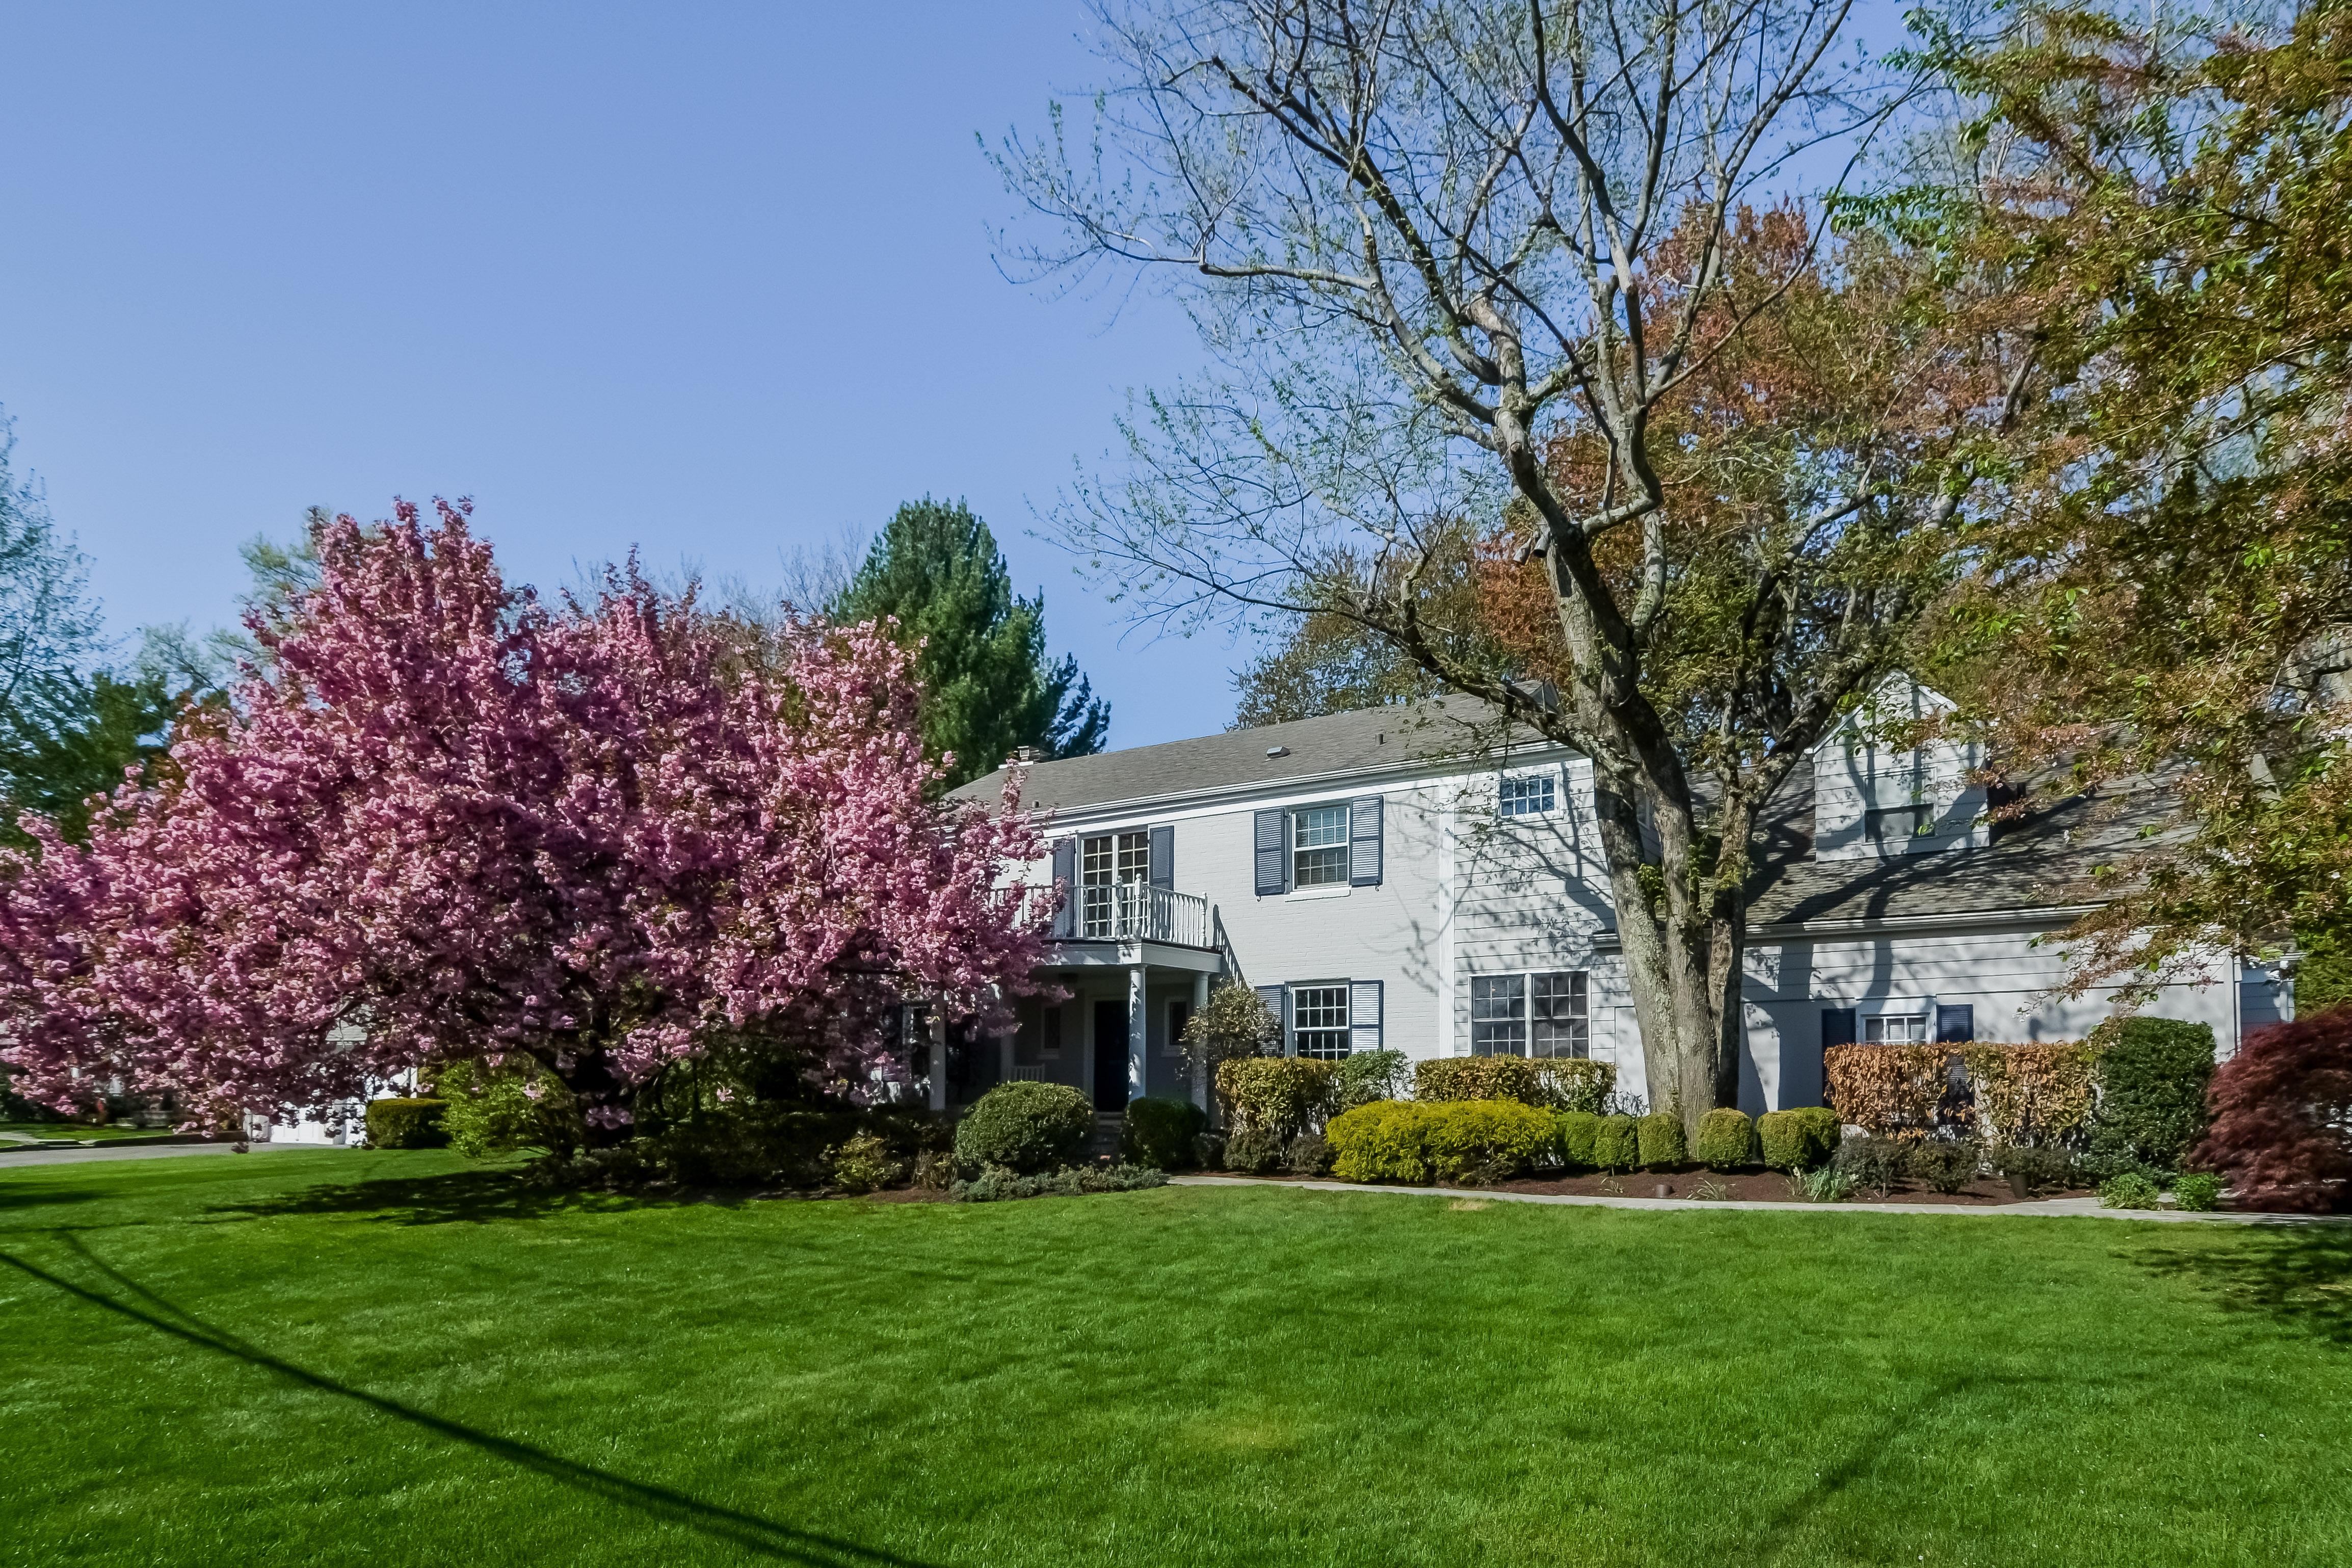 独户住宅 为 销售 在 Beautiful Colonial 6 Hillview Drive Scarsdale, 纽约州 10583 美国